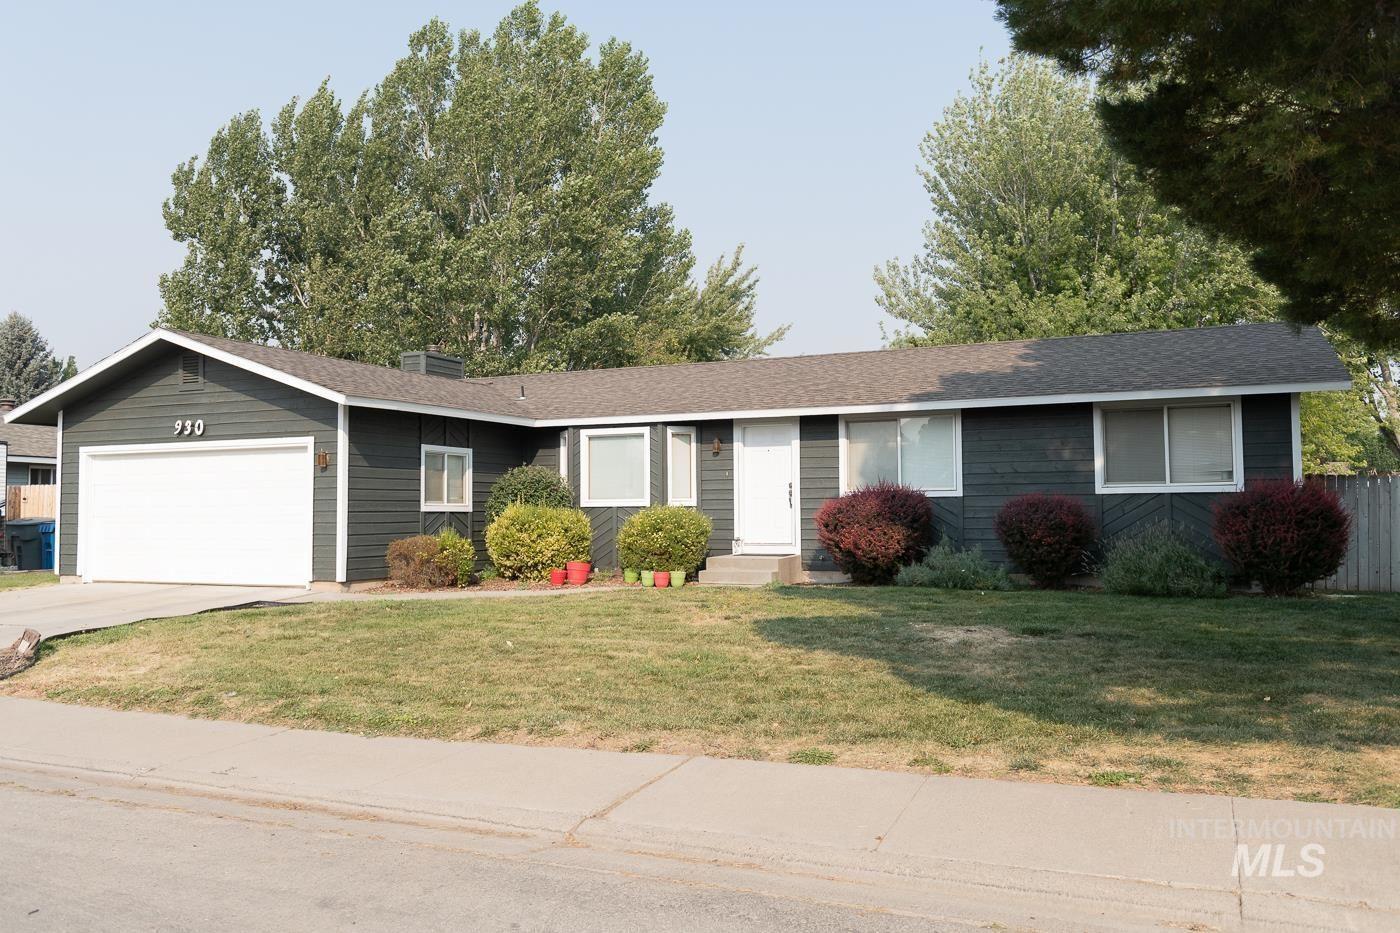 930 S Haskett, Mountain Home, ID 83647 - MLS#: 98821992